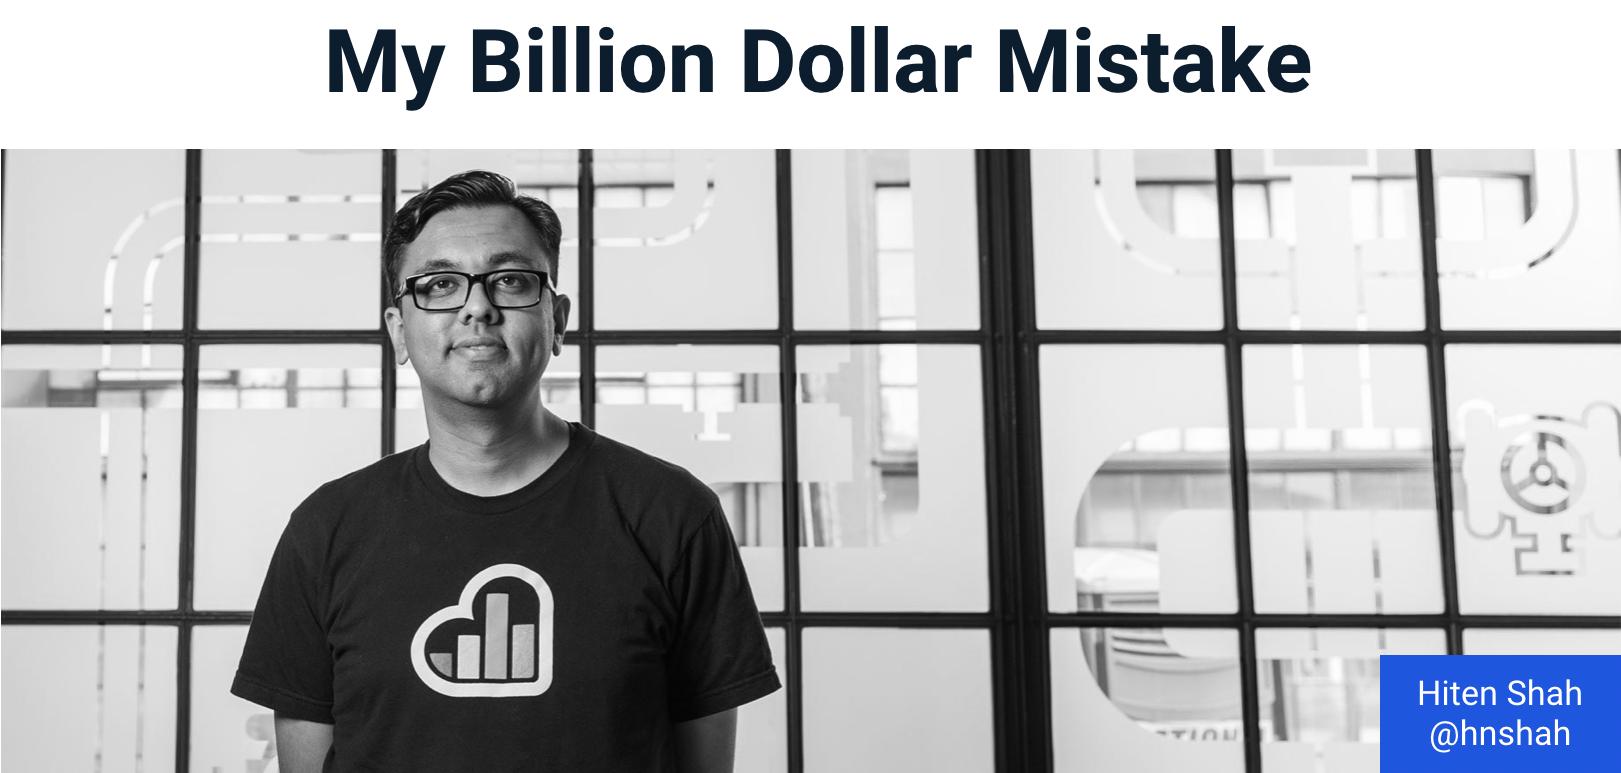 My Billion Dollar Mistake